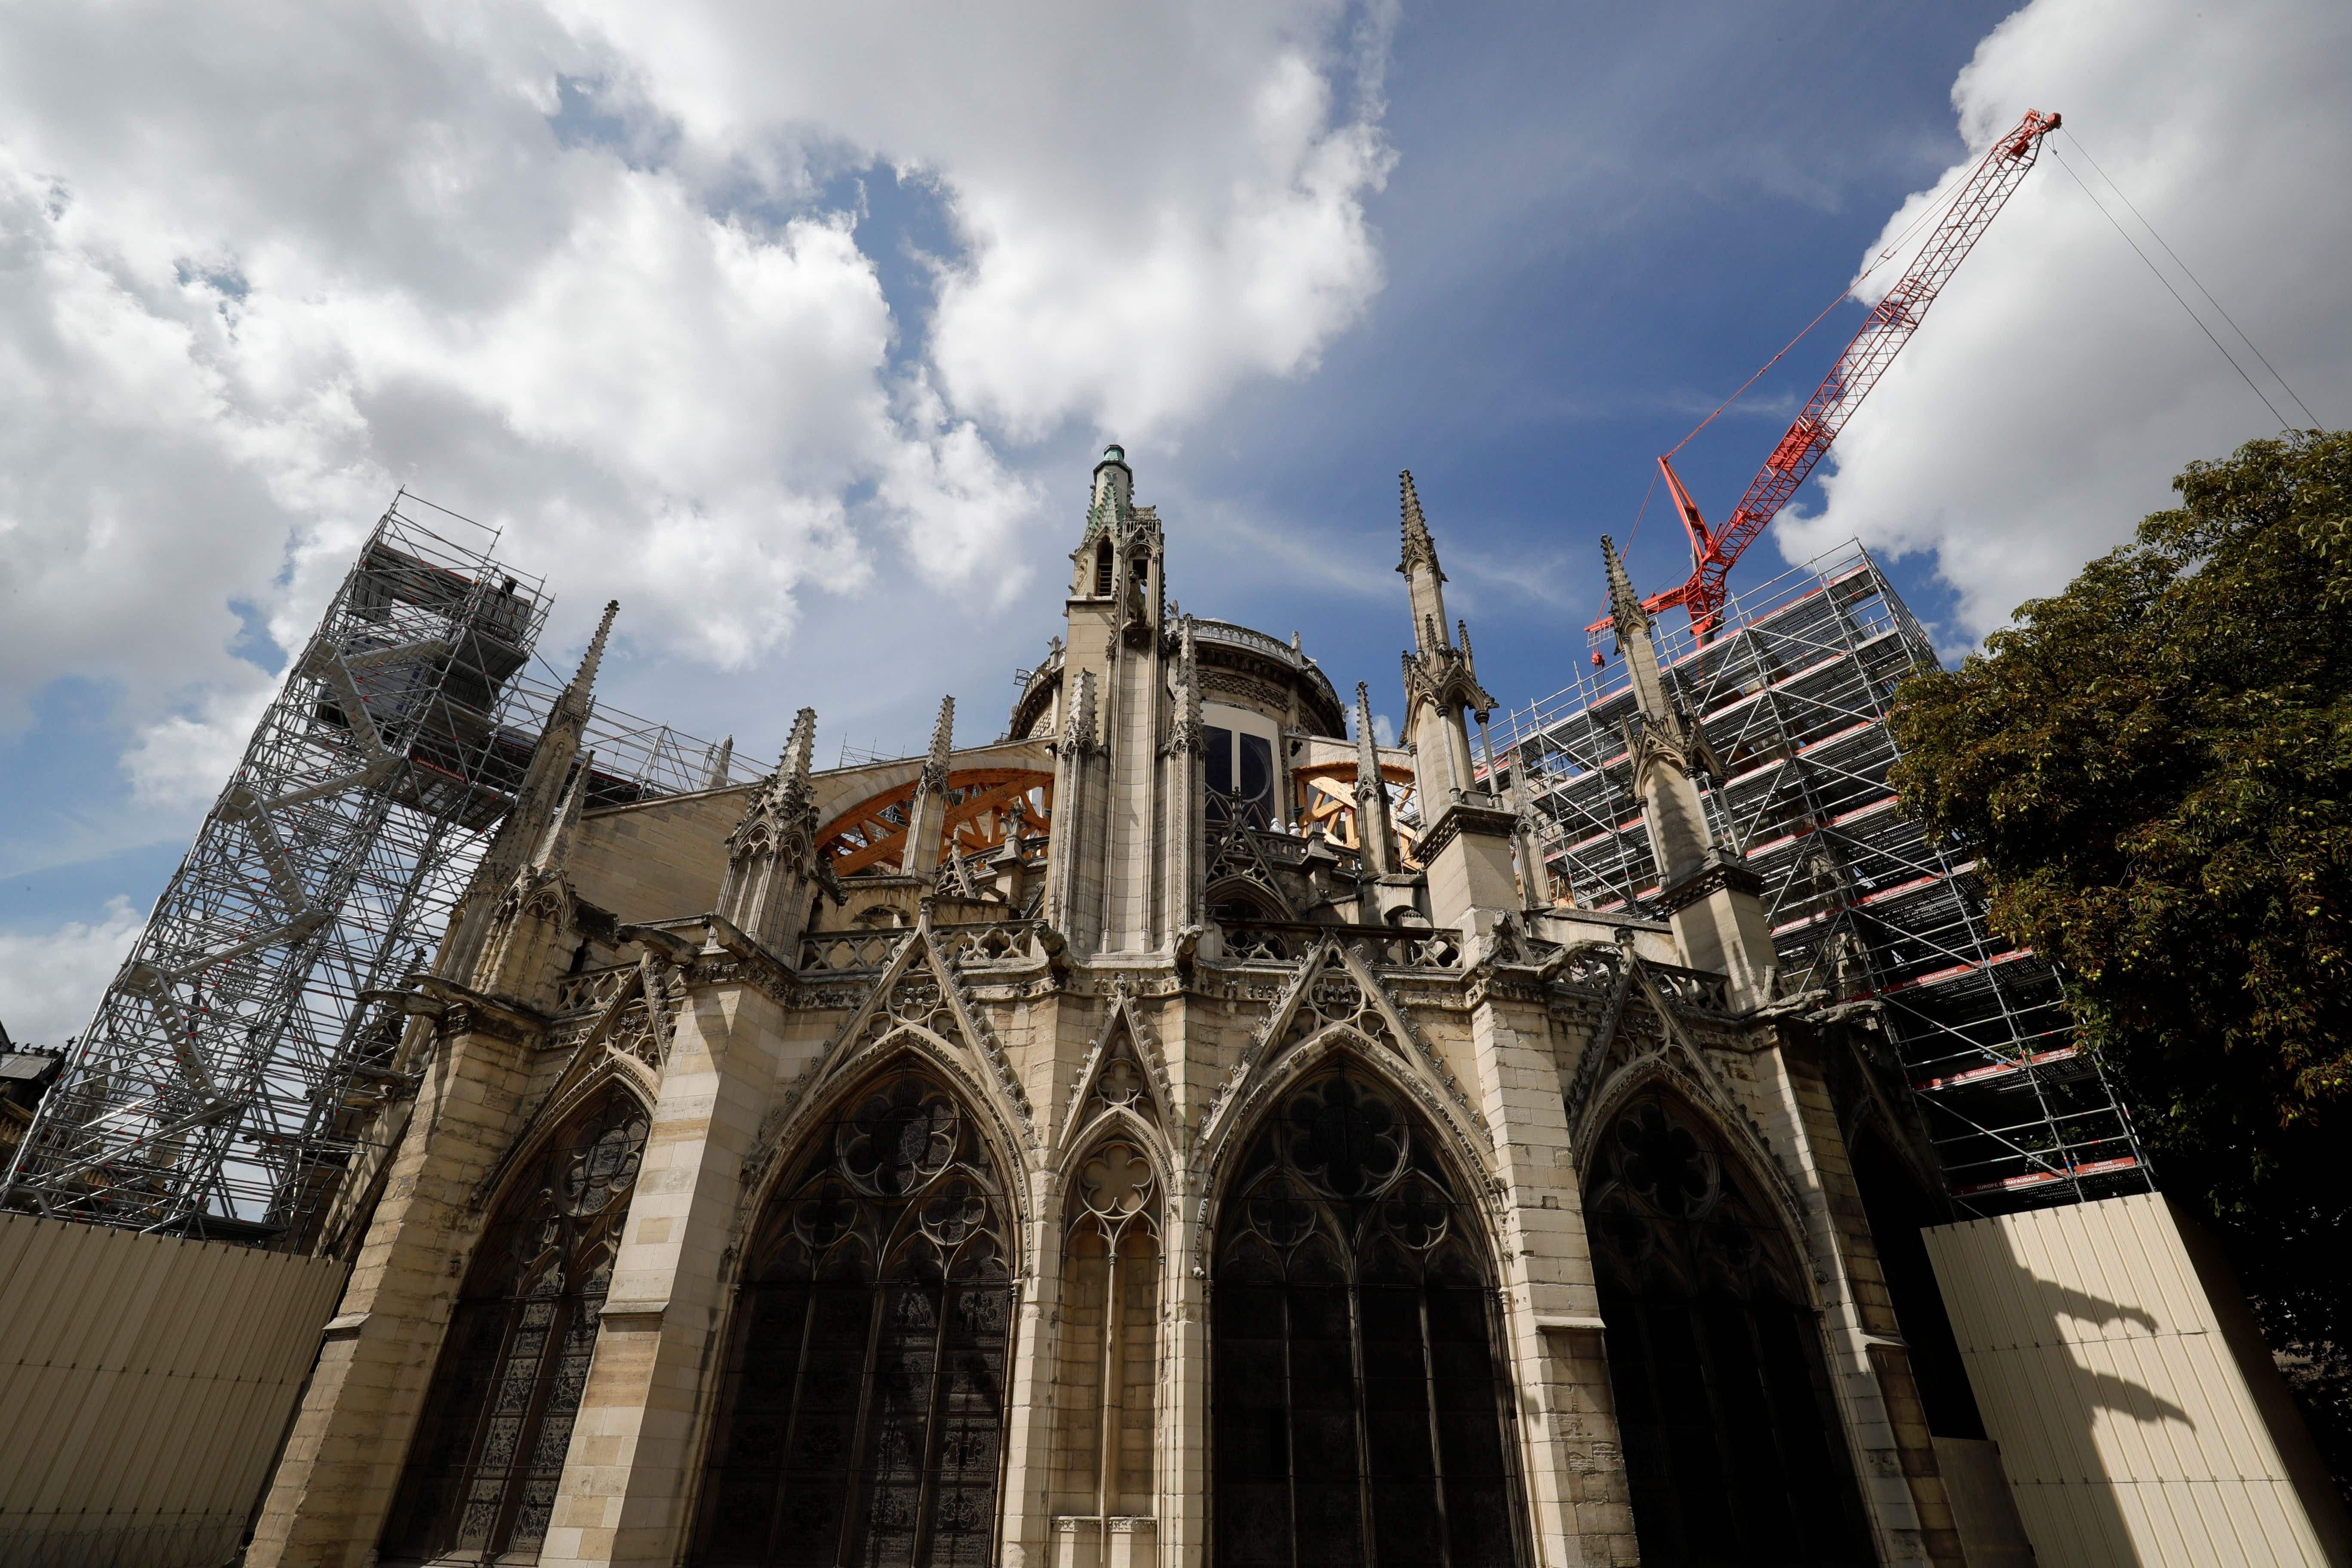 Notre Dame's cleanup efforts are back on track